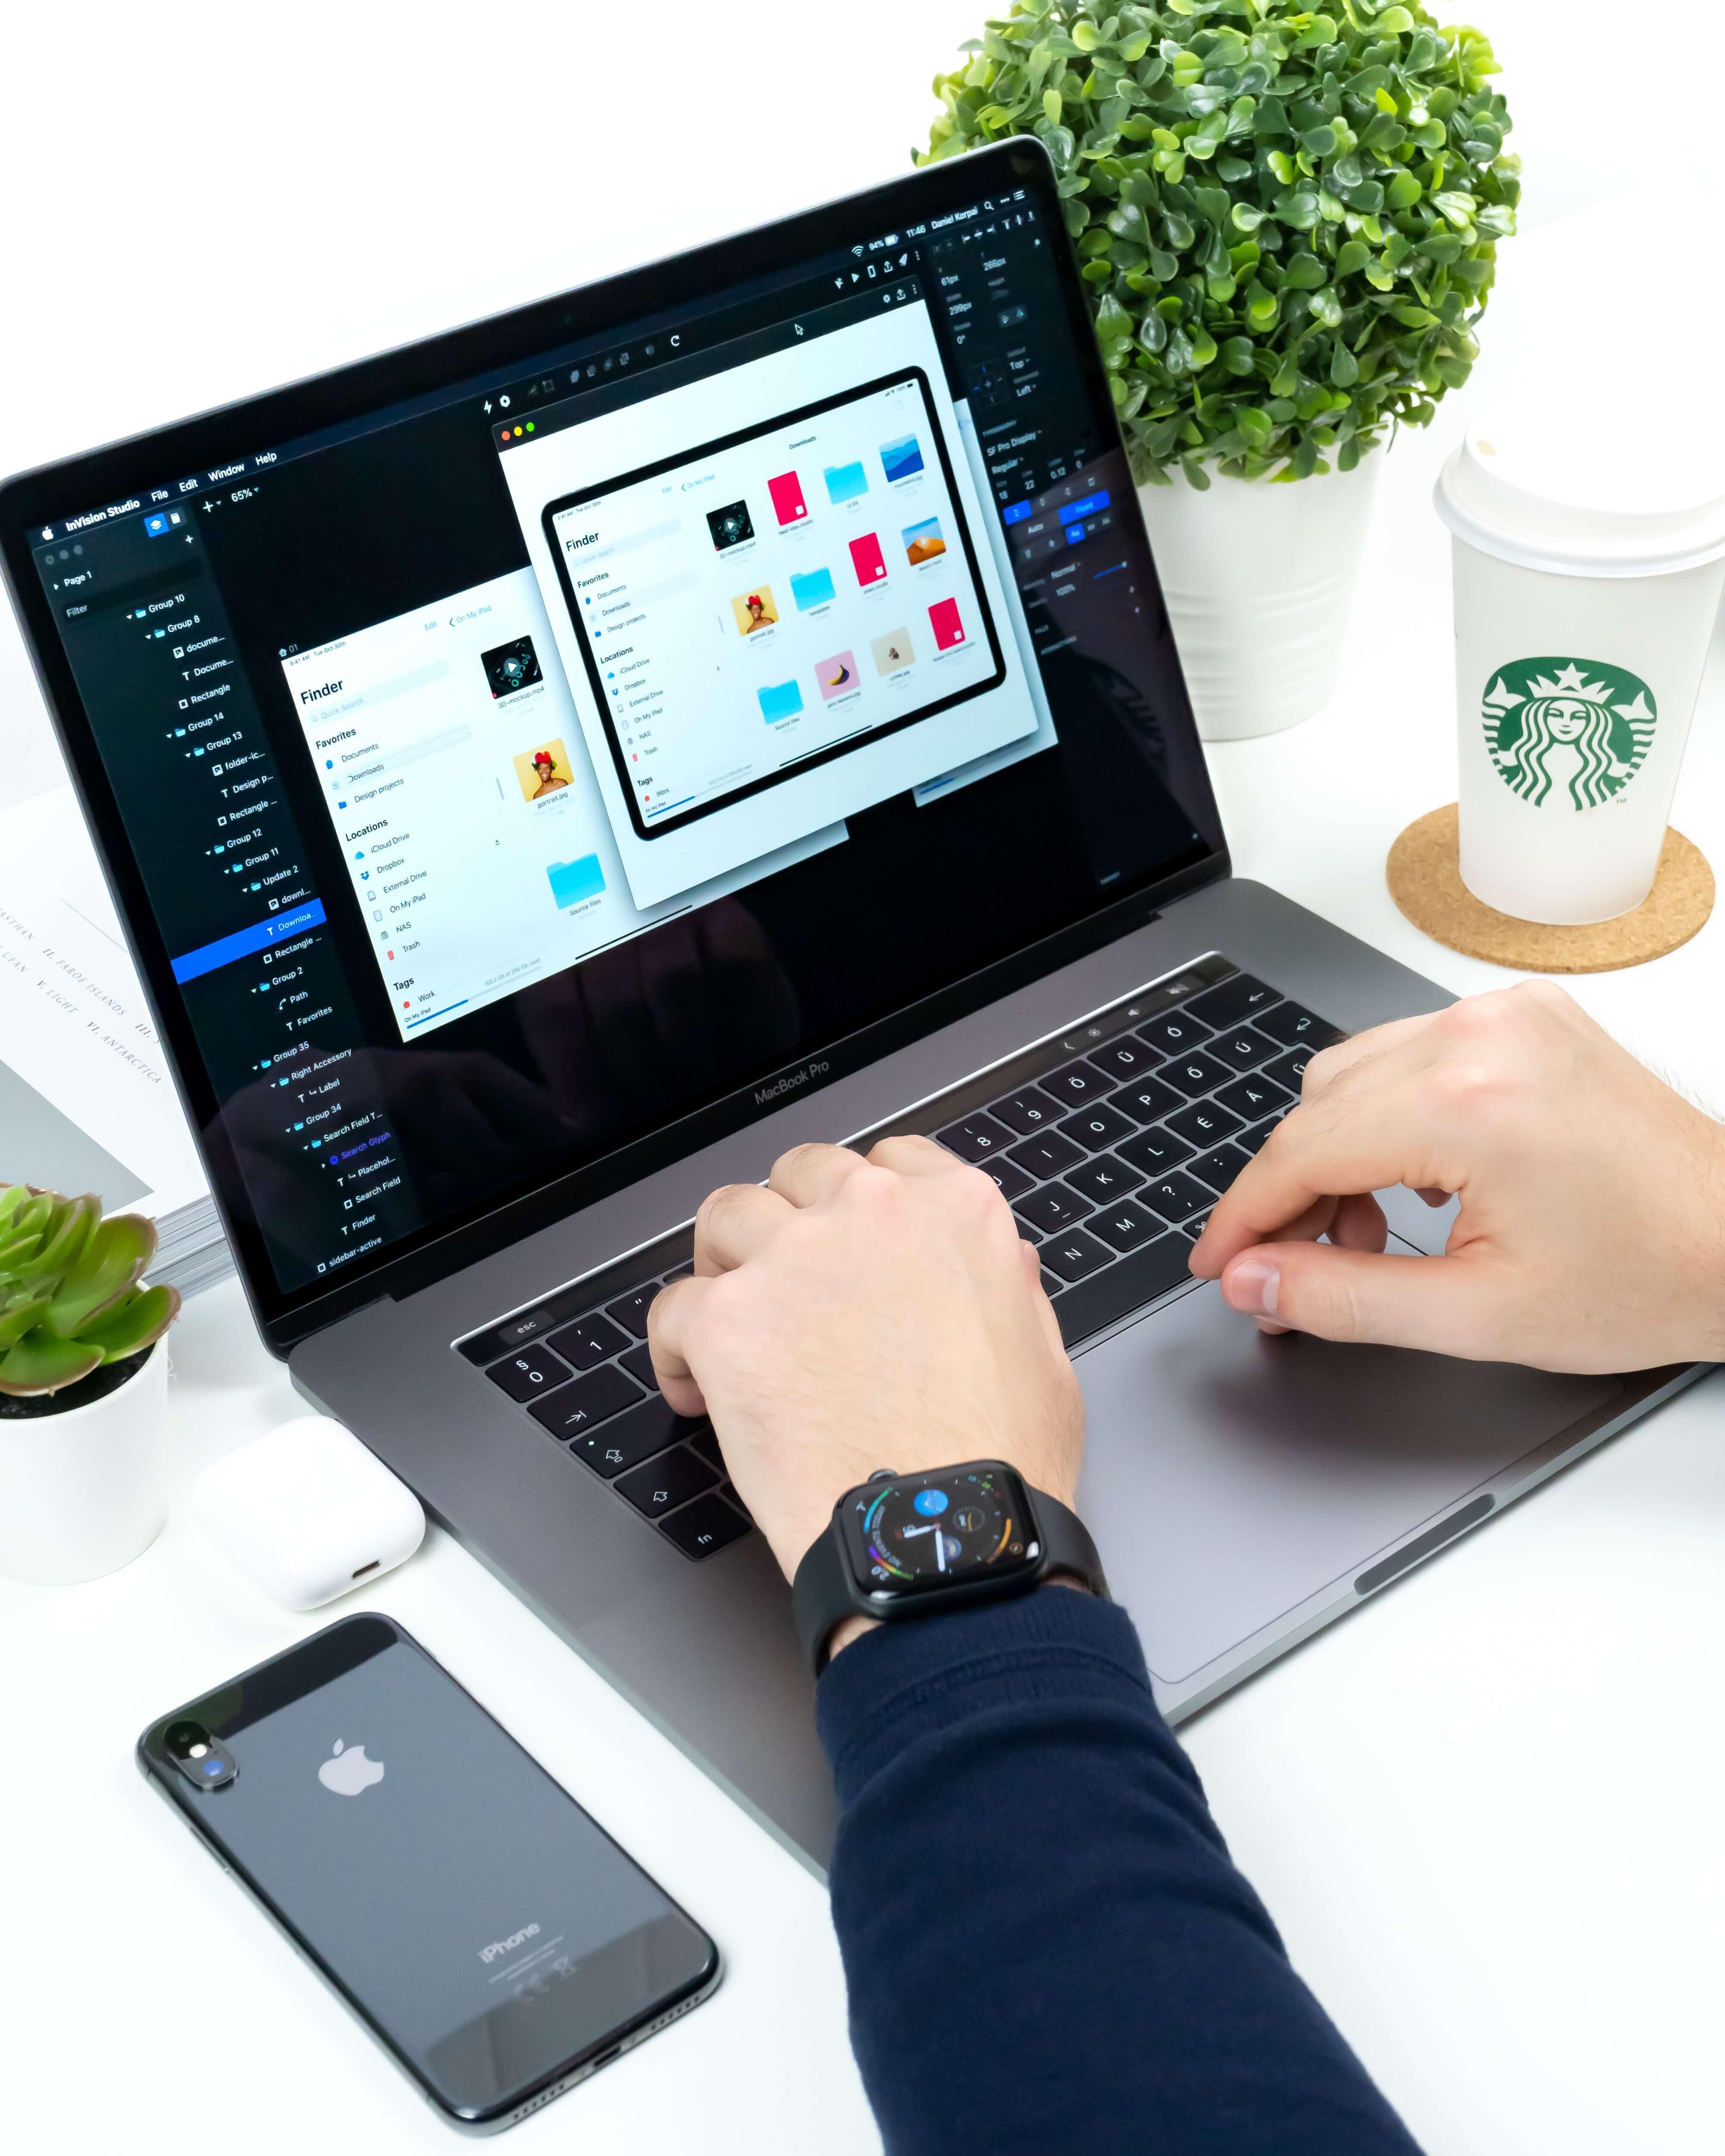 macbook avec interface de design web